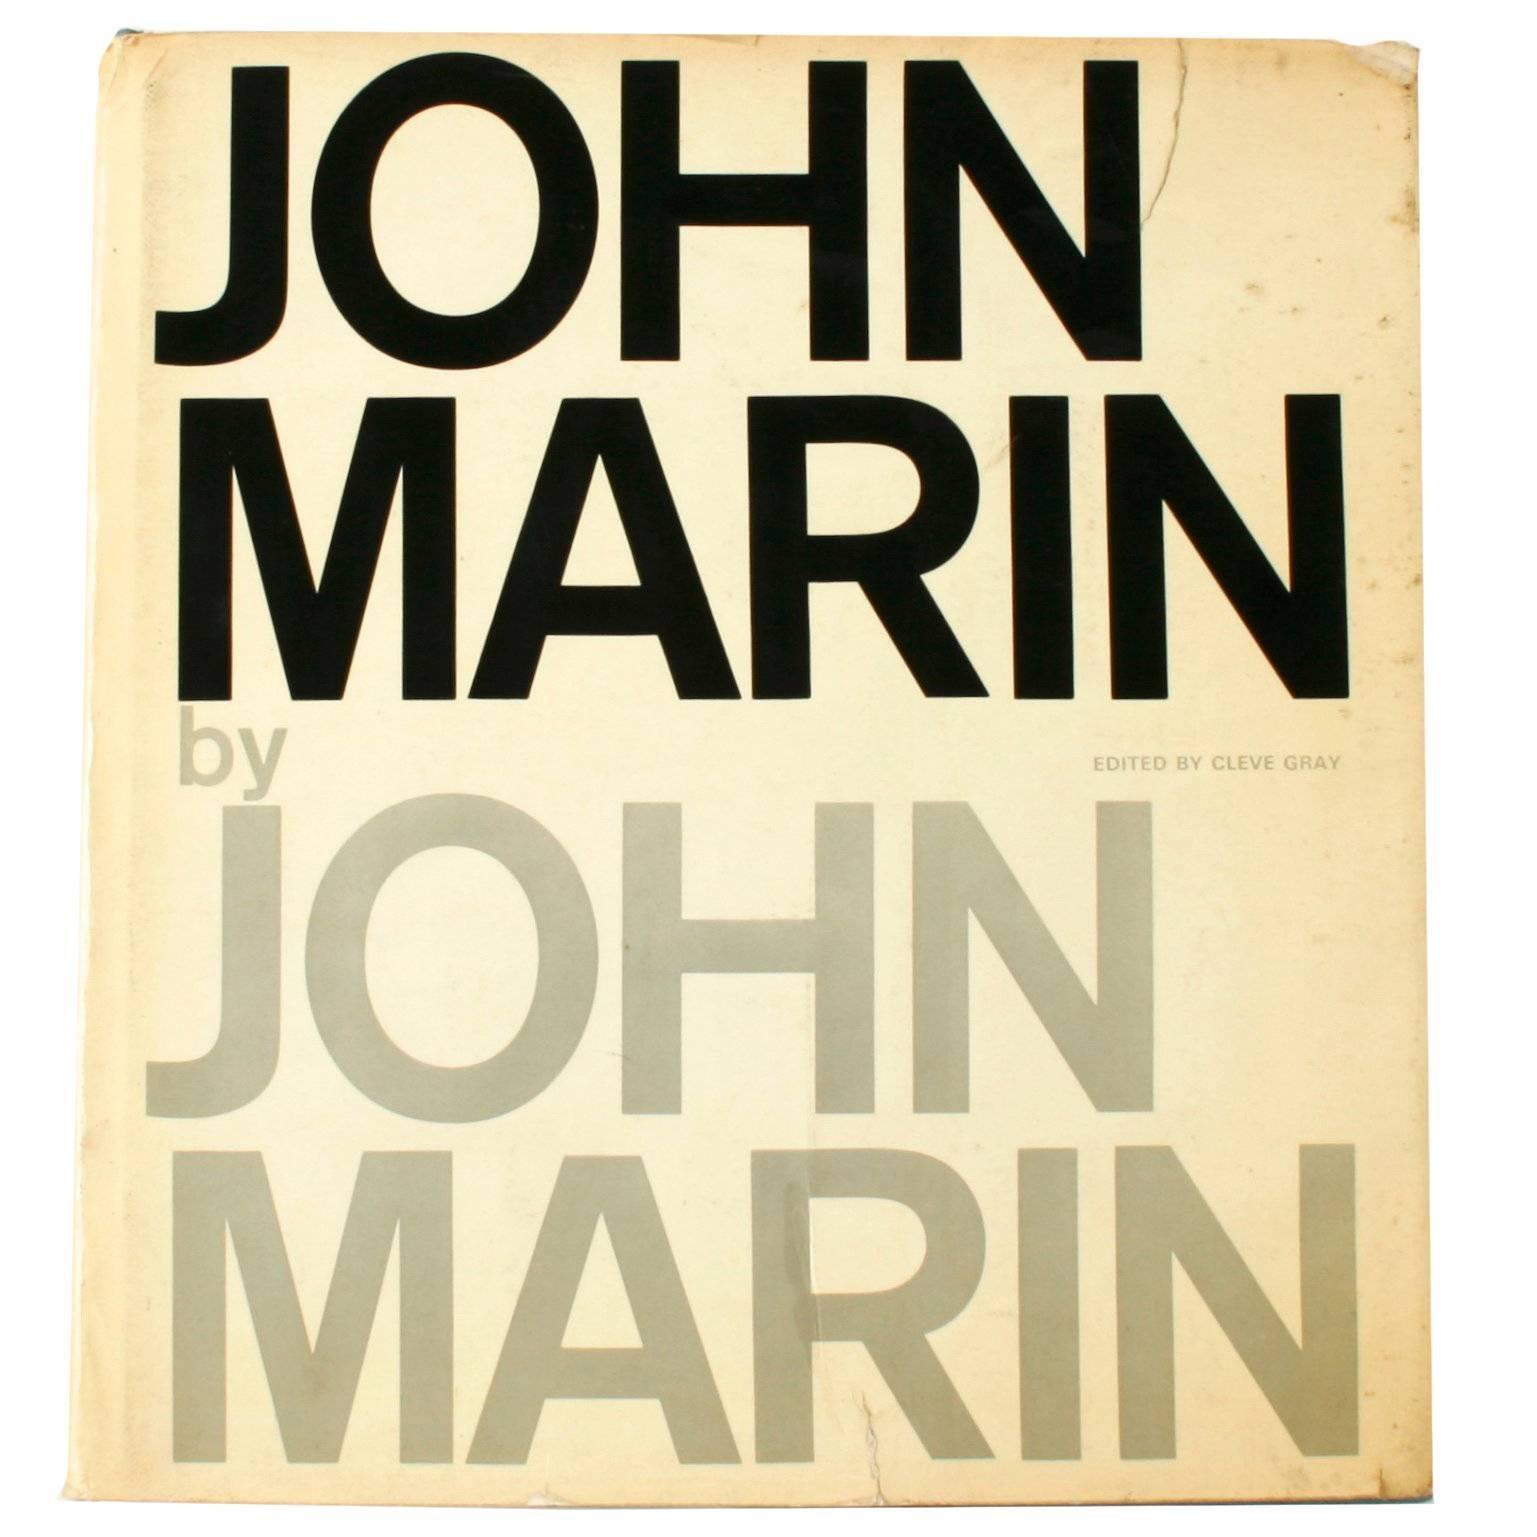 John Marin by John Marin, 1st Ed